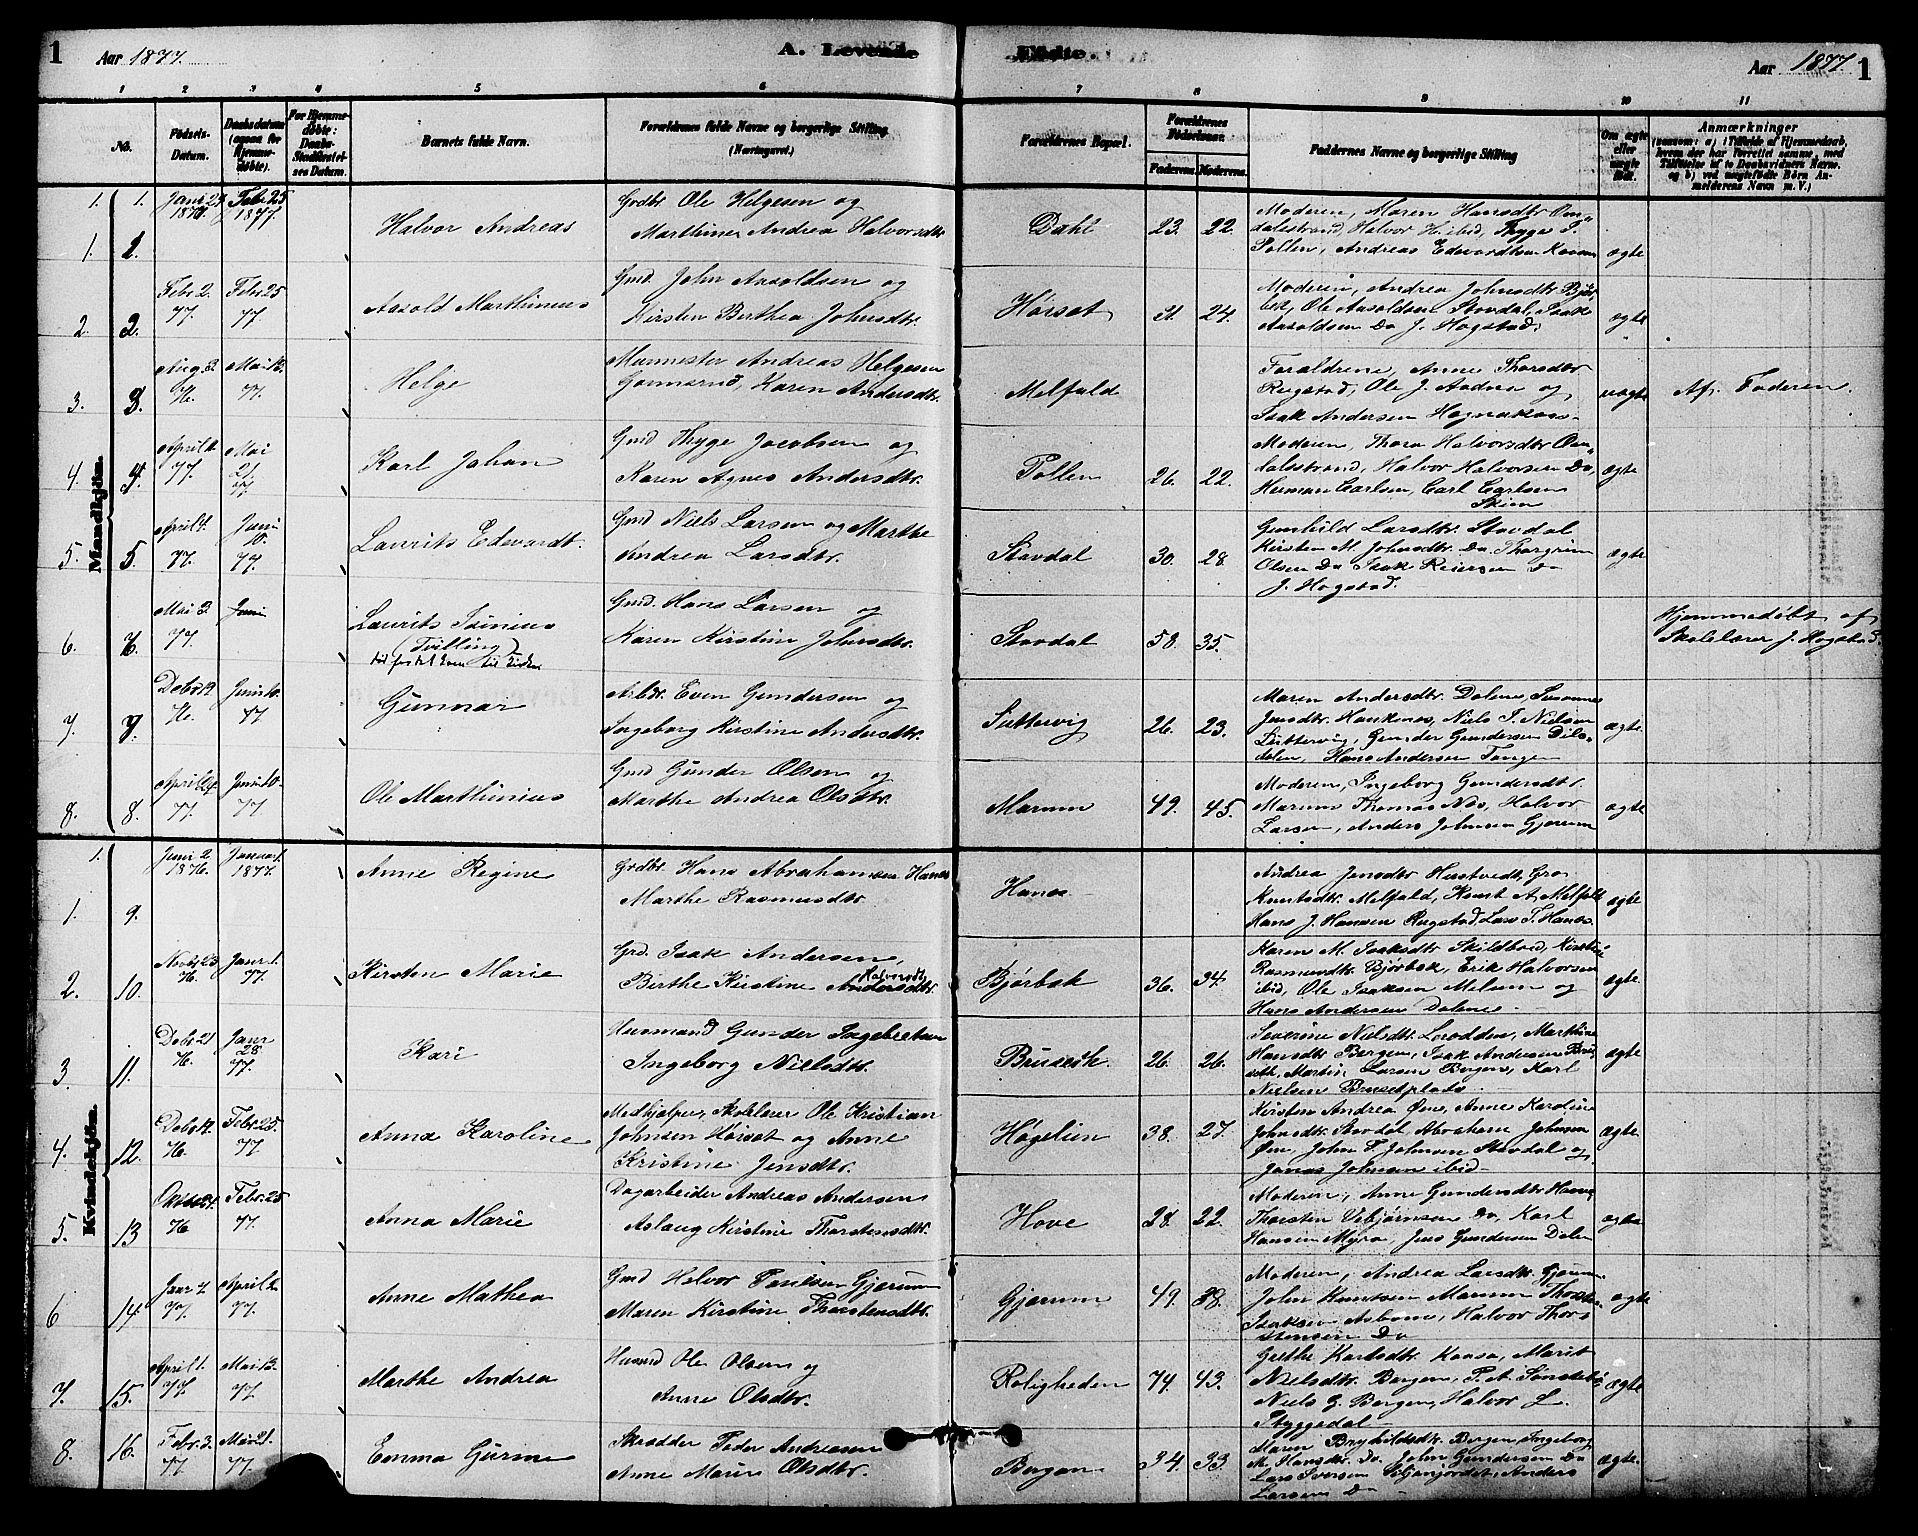 SAKO, Solum kirkebøker, F/Fb/L0001: Ministerialbok nr. II 1, 1877-1892, s. 1